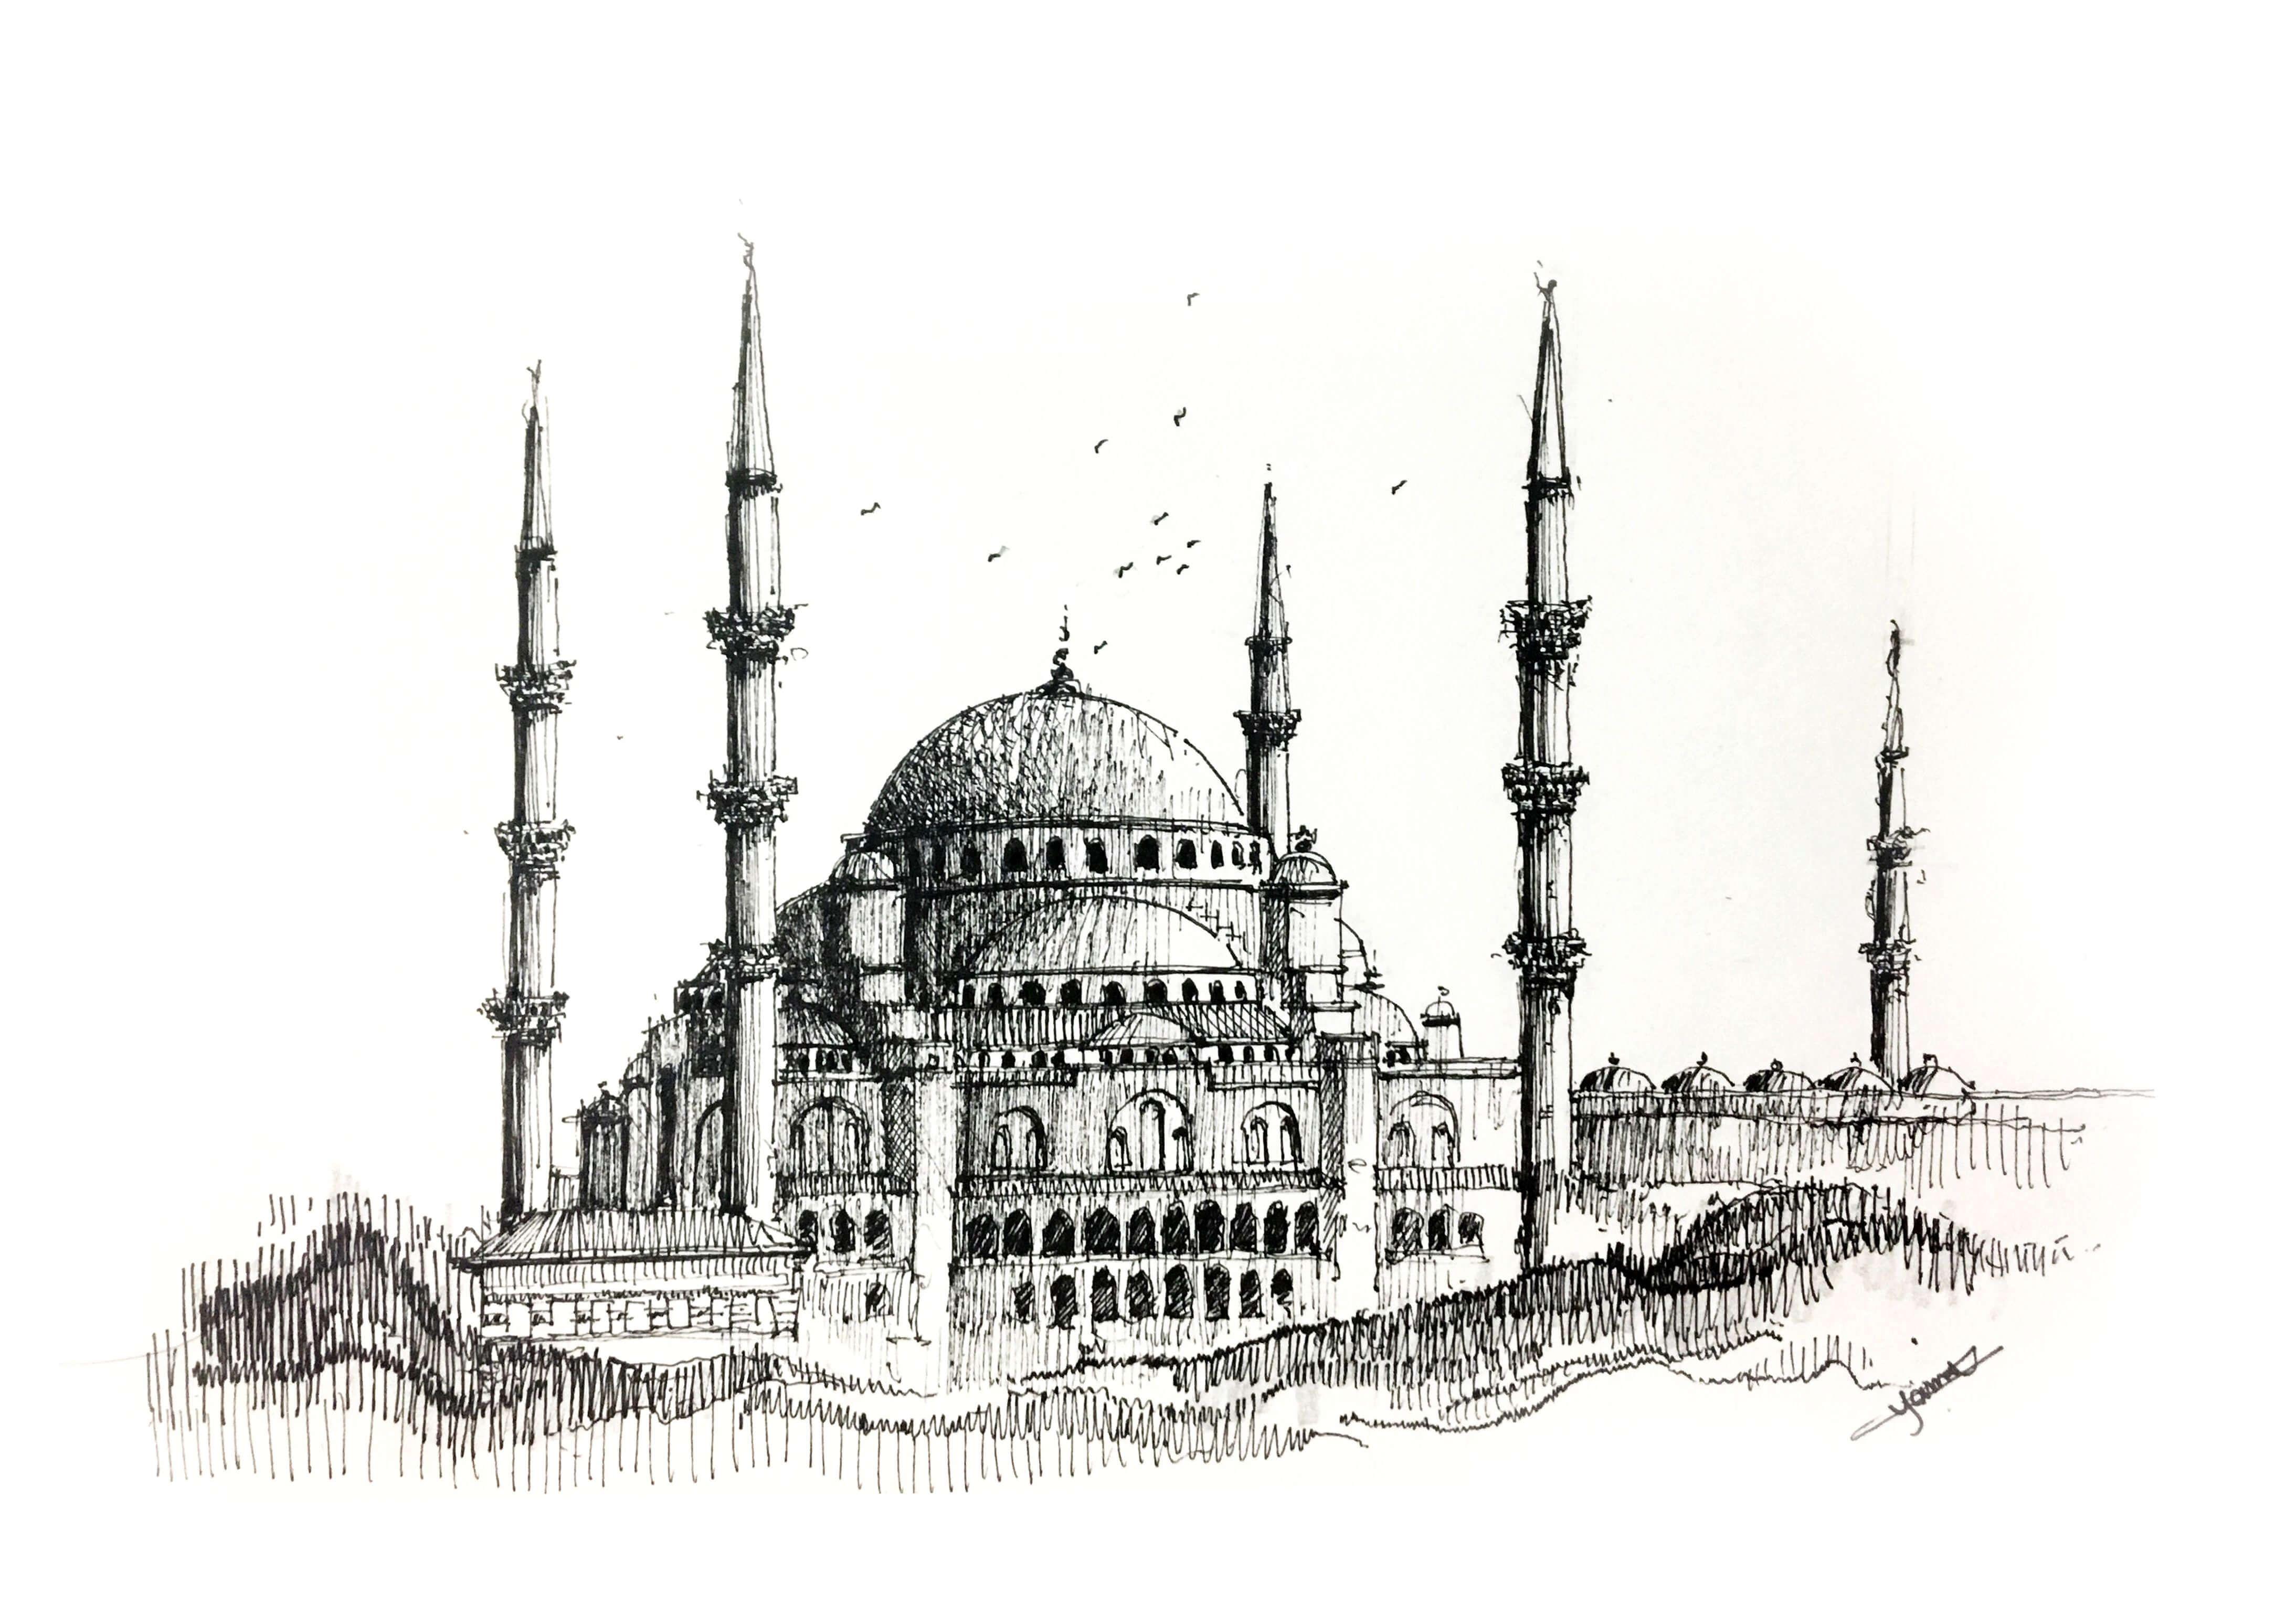 Karakalem Cami Resimleri Charcoal Mosque Drawings 2020 2020 Mimari Cizim Taslaklari Resim Camiler